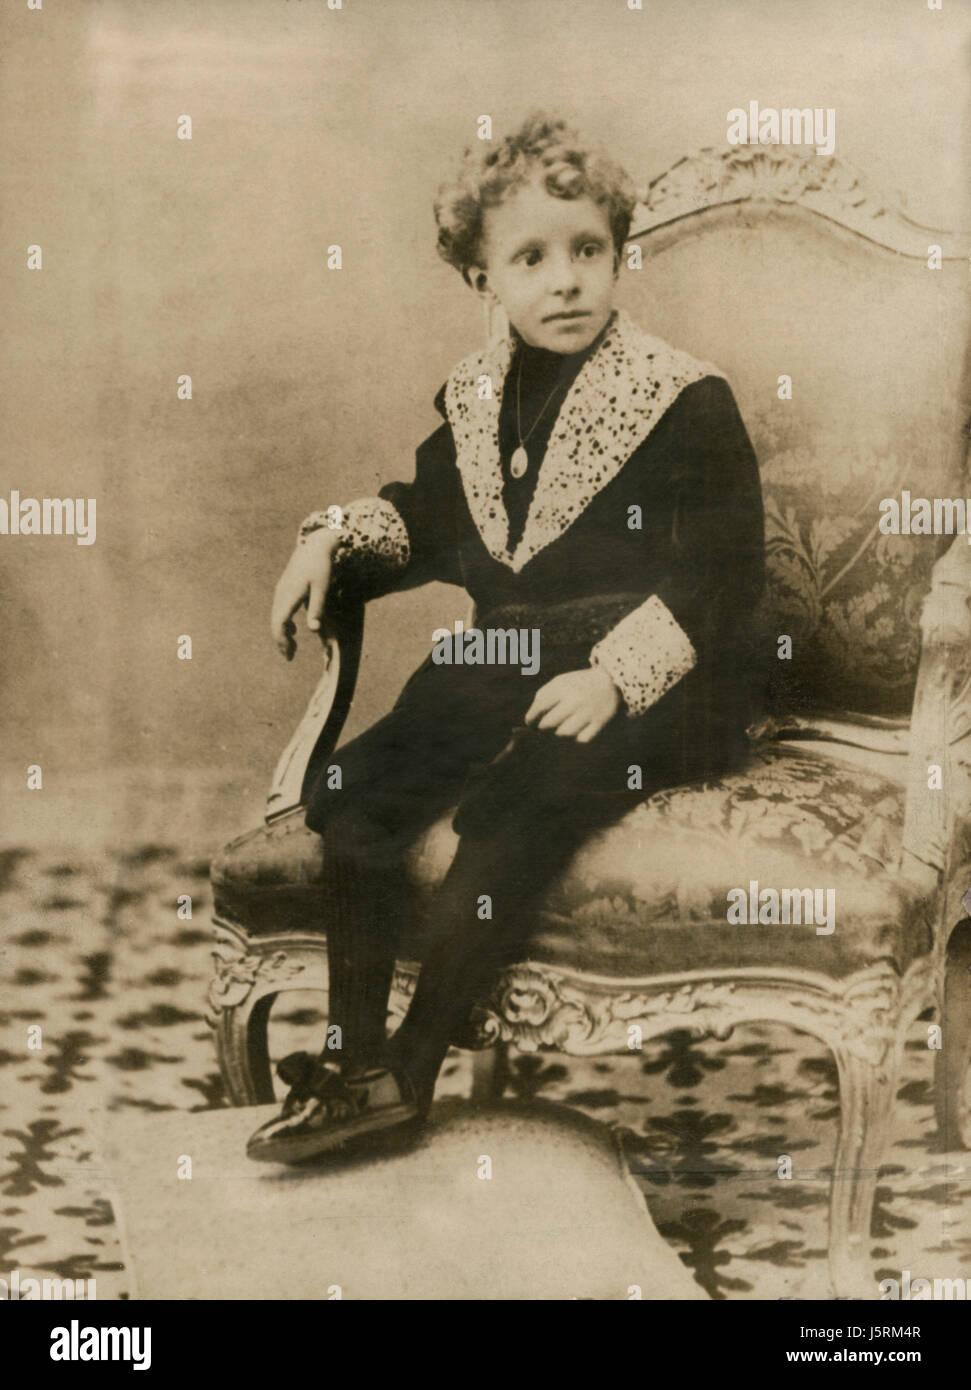 Alfonso VIII (1886-1941), King of Spain, Portrait, 1892